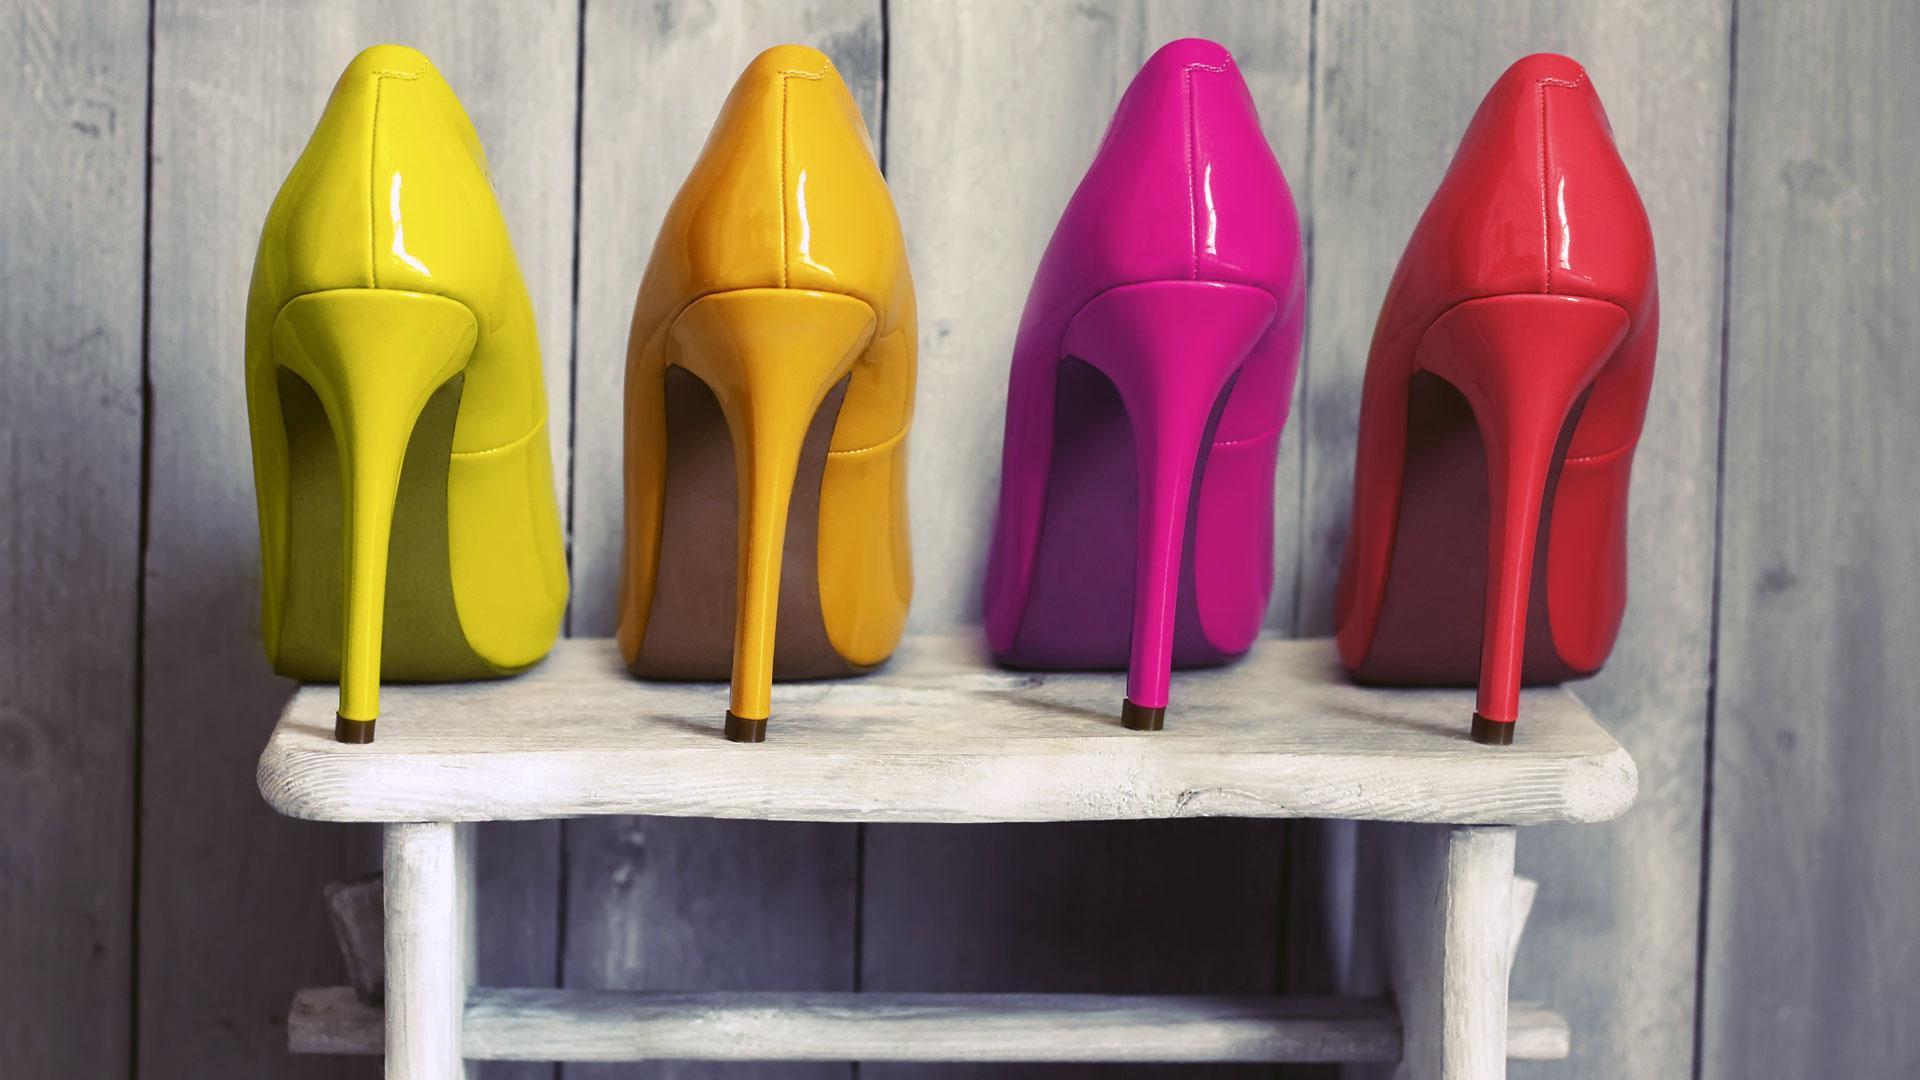 6 Diy Shoe Rack Ideas To Organize Your Closet Sheknows